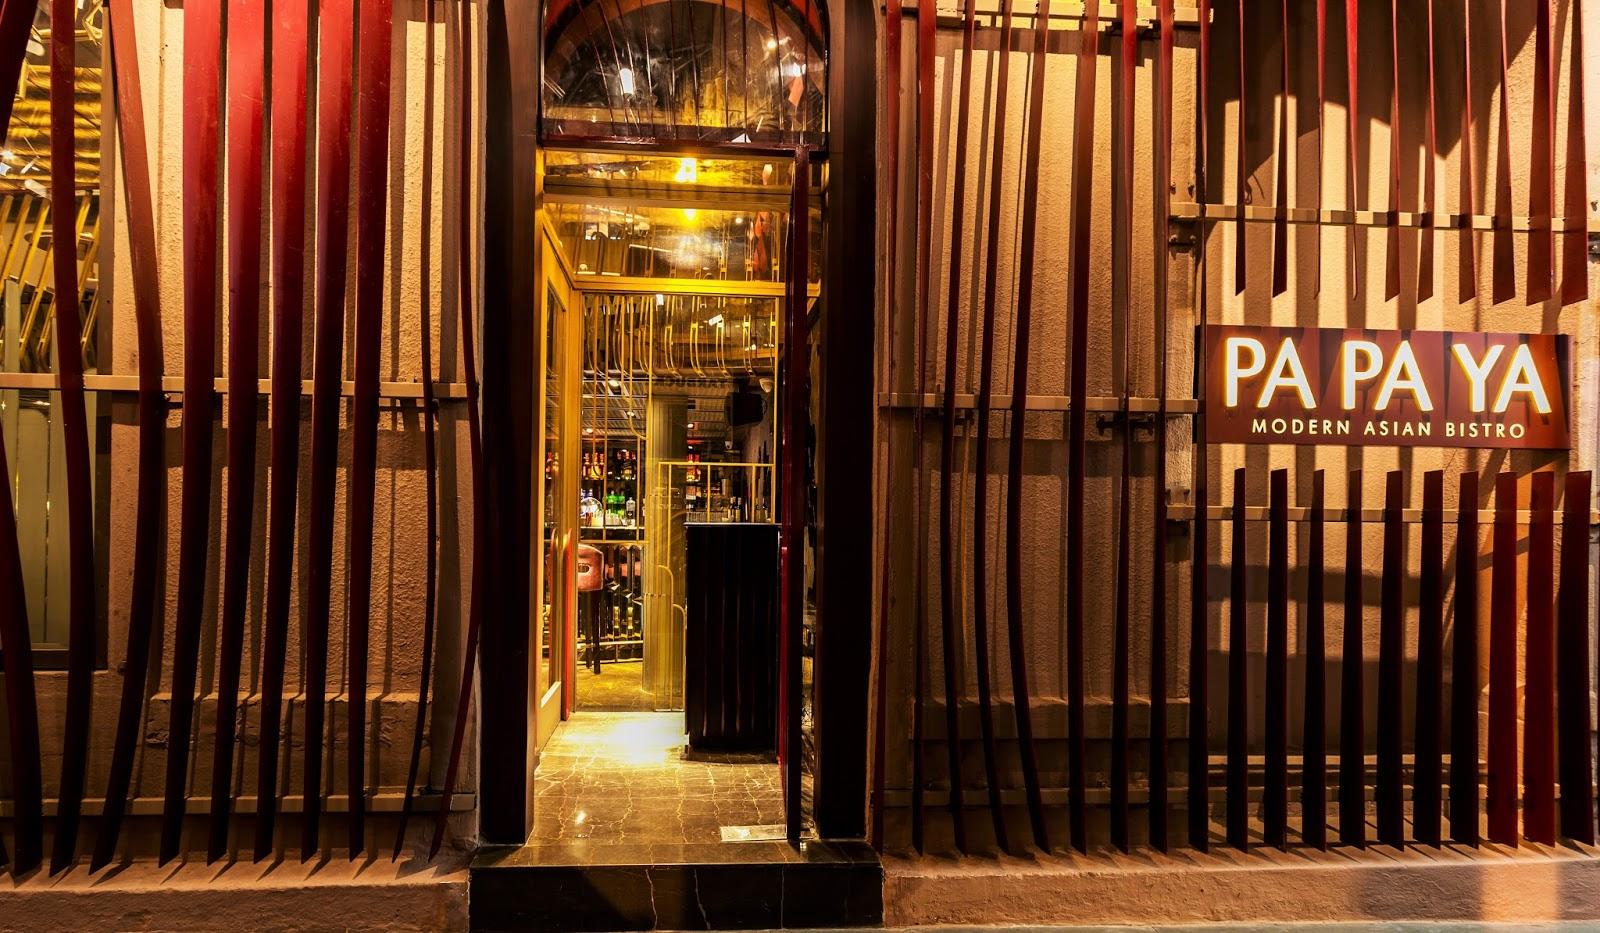 Pa Pa Ya - Hotel Diplomat - Colaba - Mumbai Image